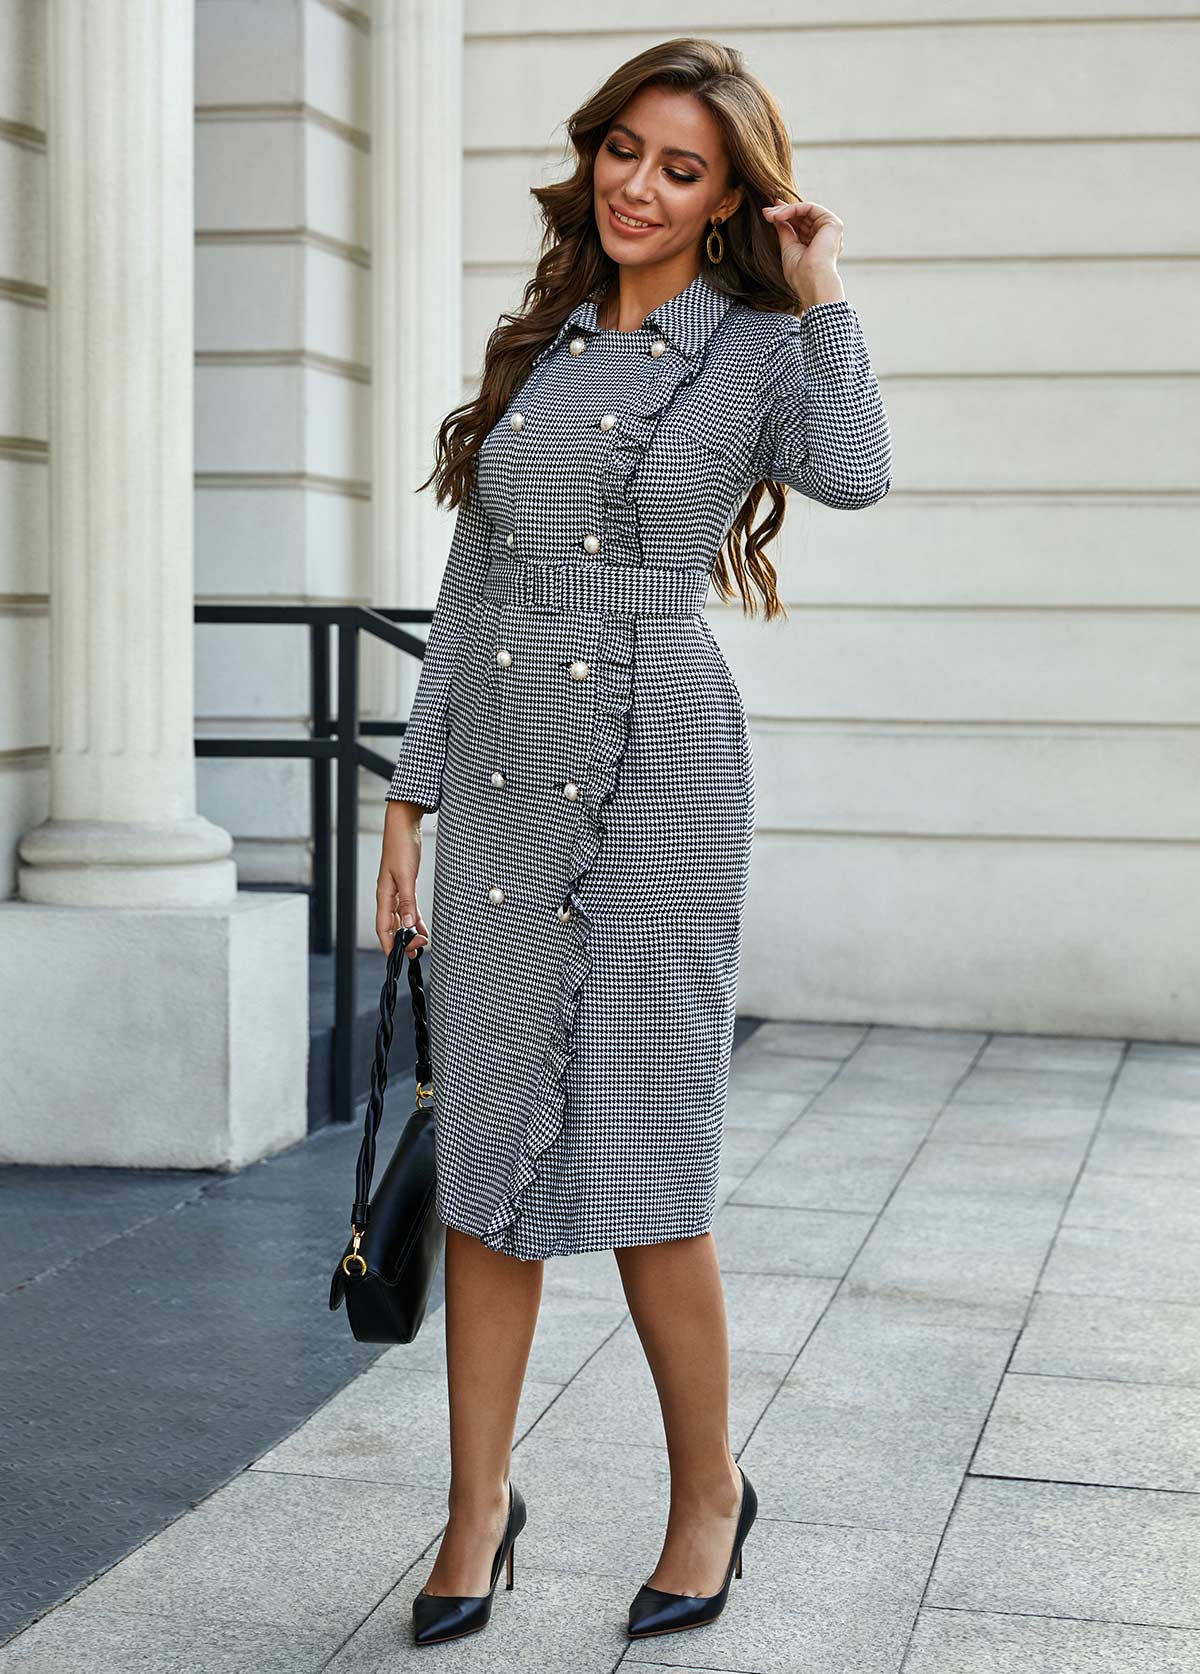 Houndstooth Print Turndown Collar Button Detail Dress